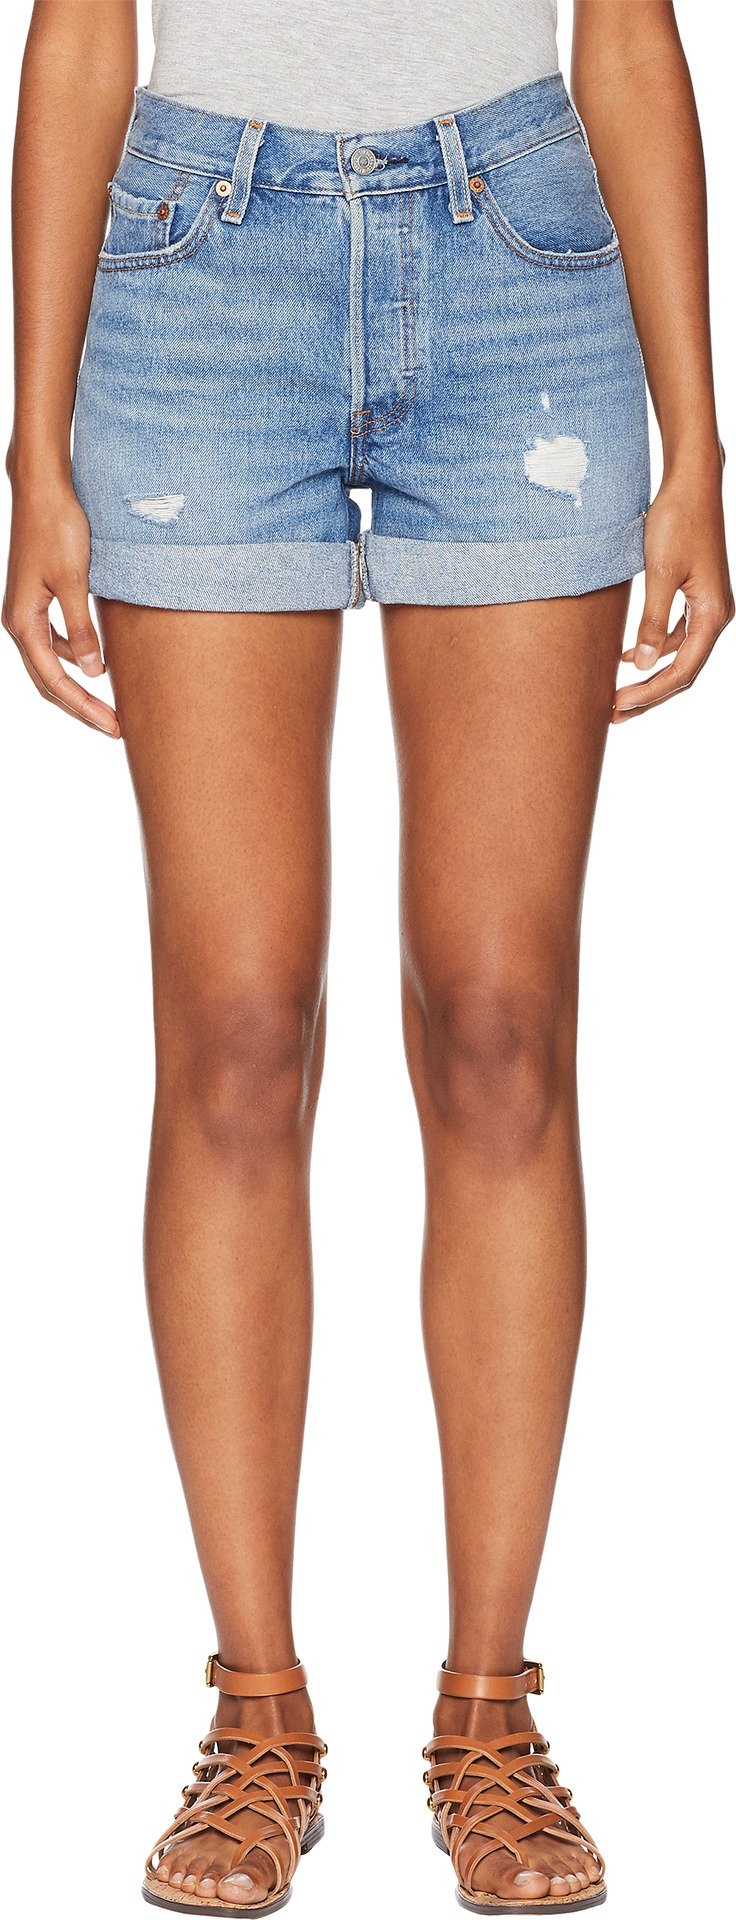 Levi's Premium Women's Premium 501 Long Shorts Highways & Biways 27 3 3